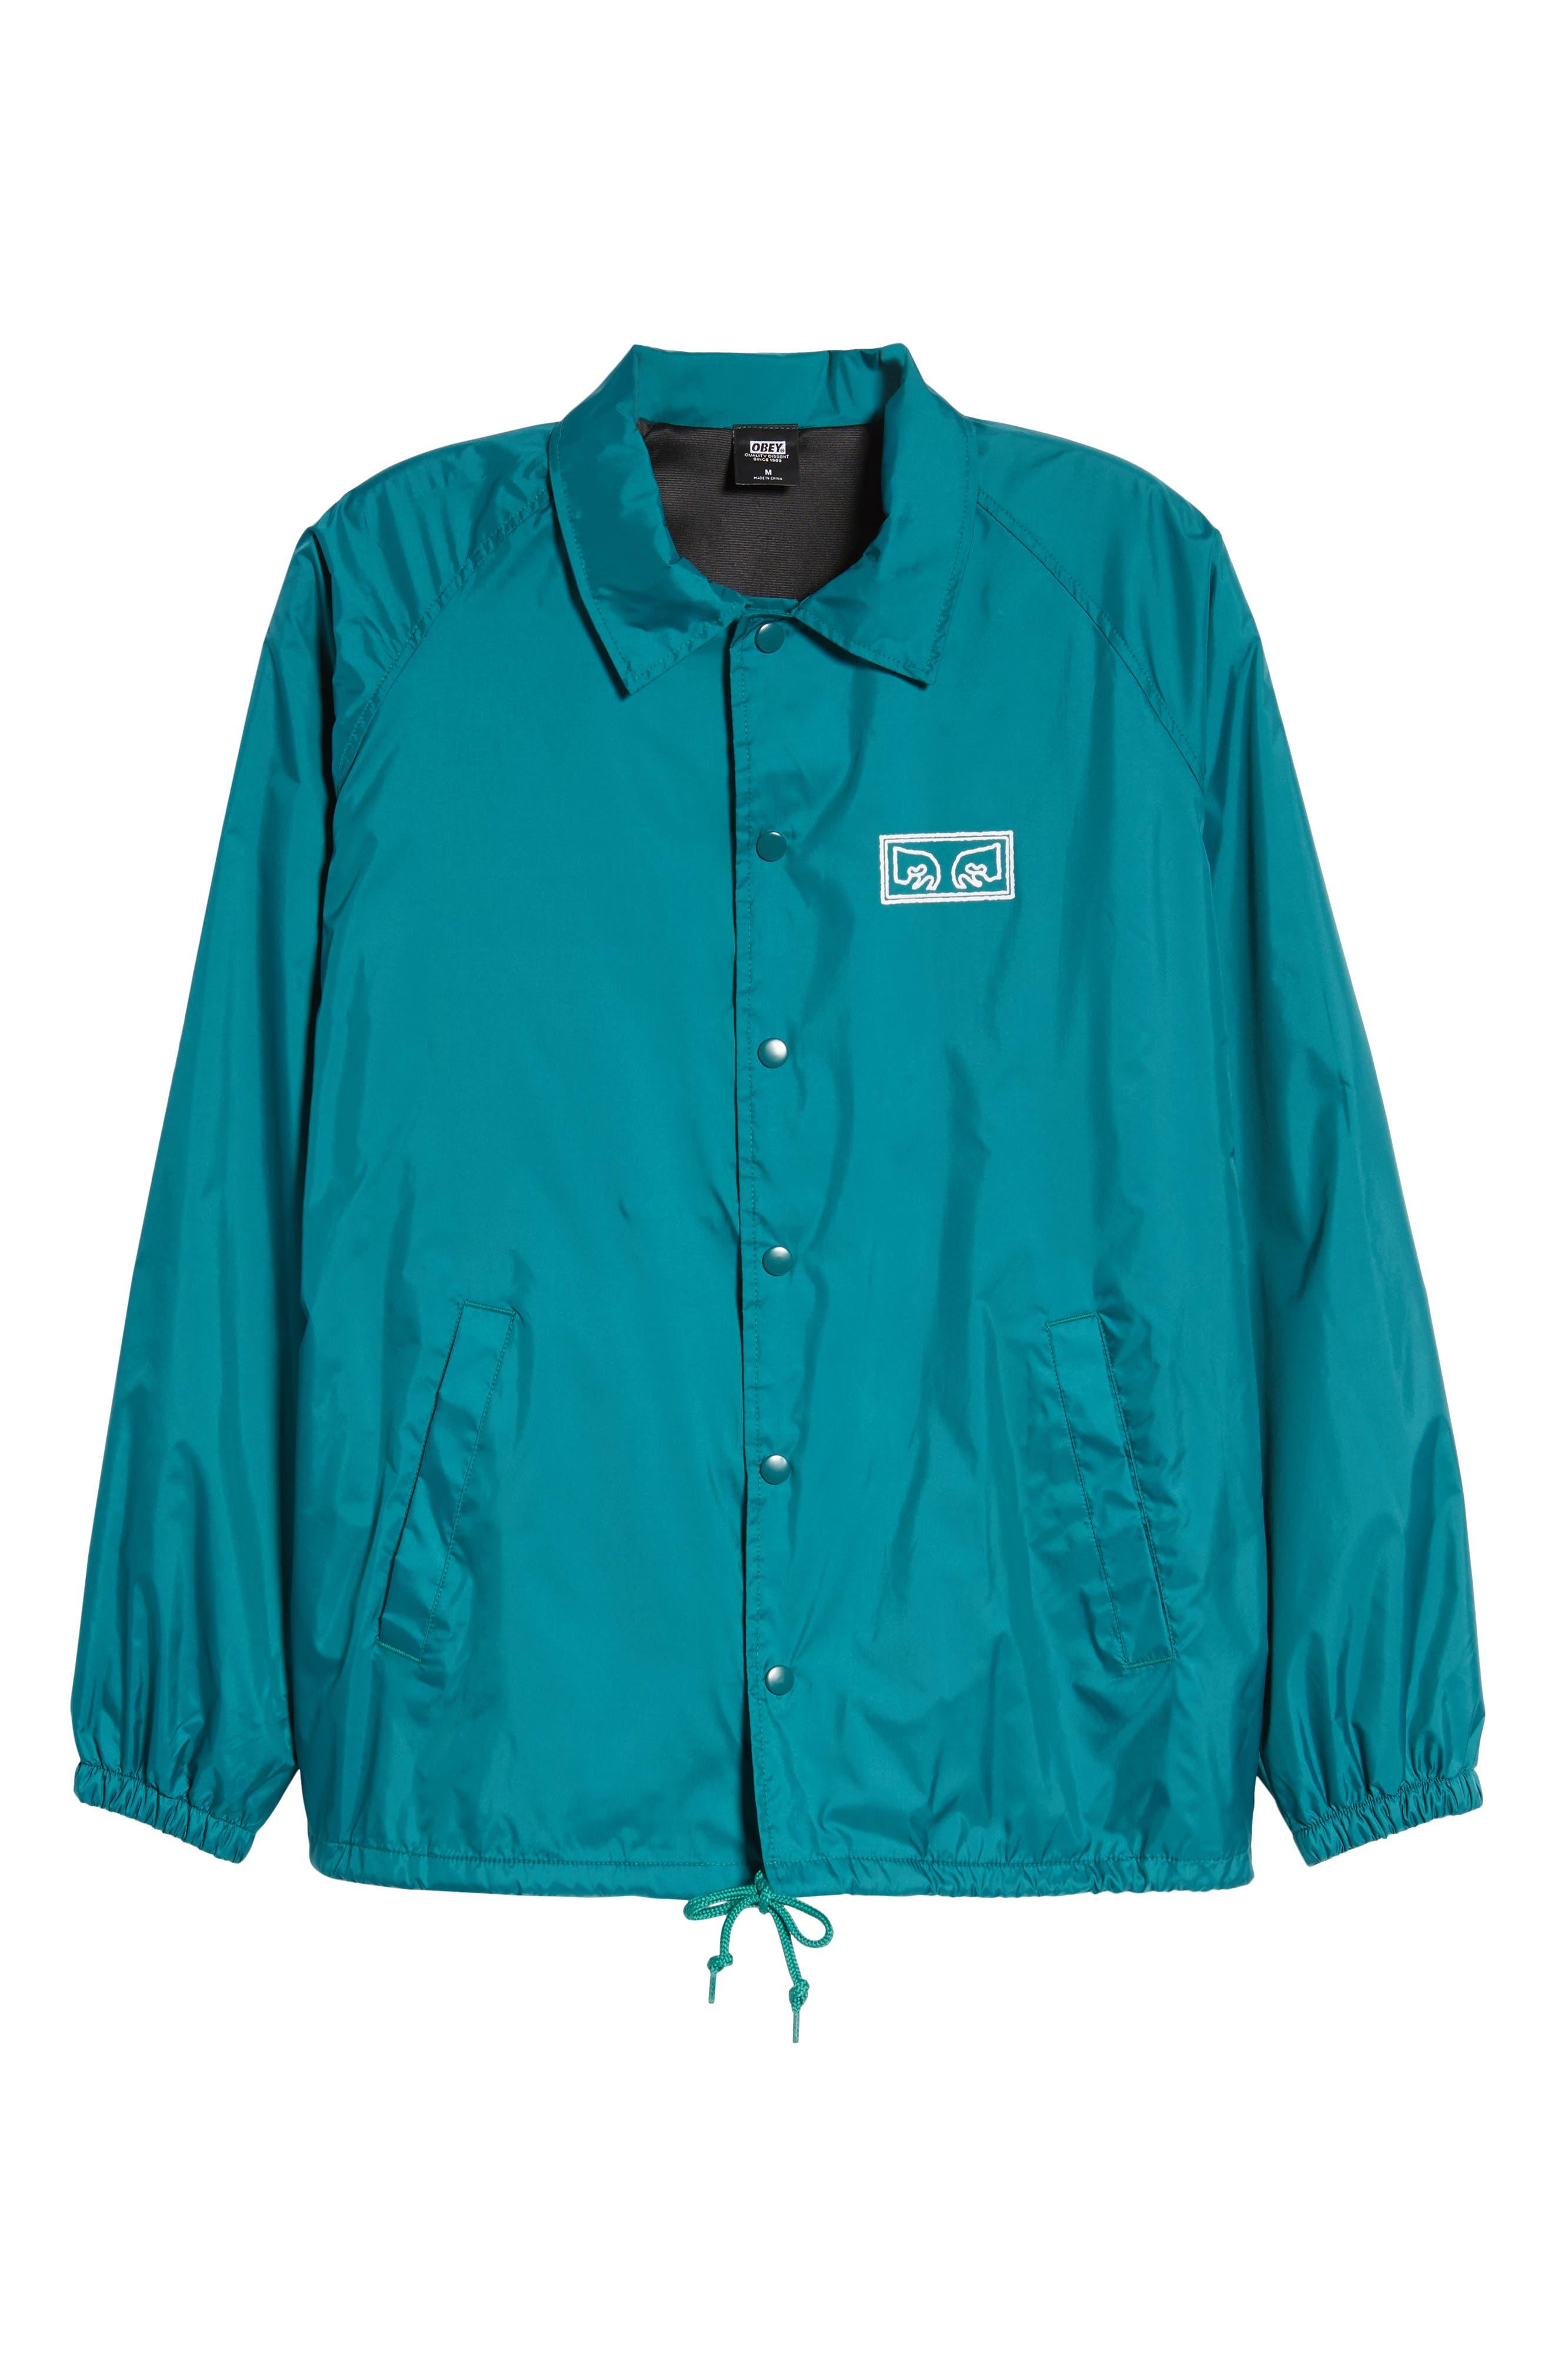 Eyes Coaches Jacket,                             Alternate thumbnail 6, color,                             Teal